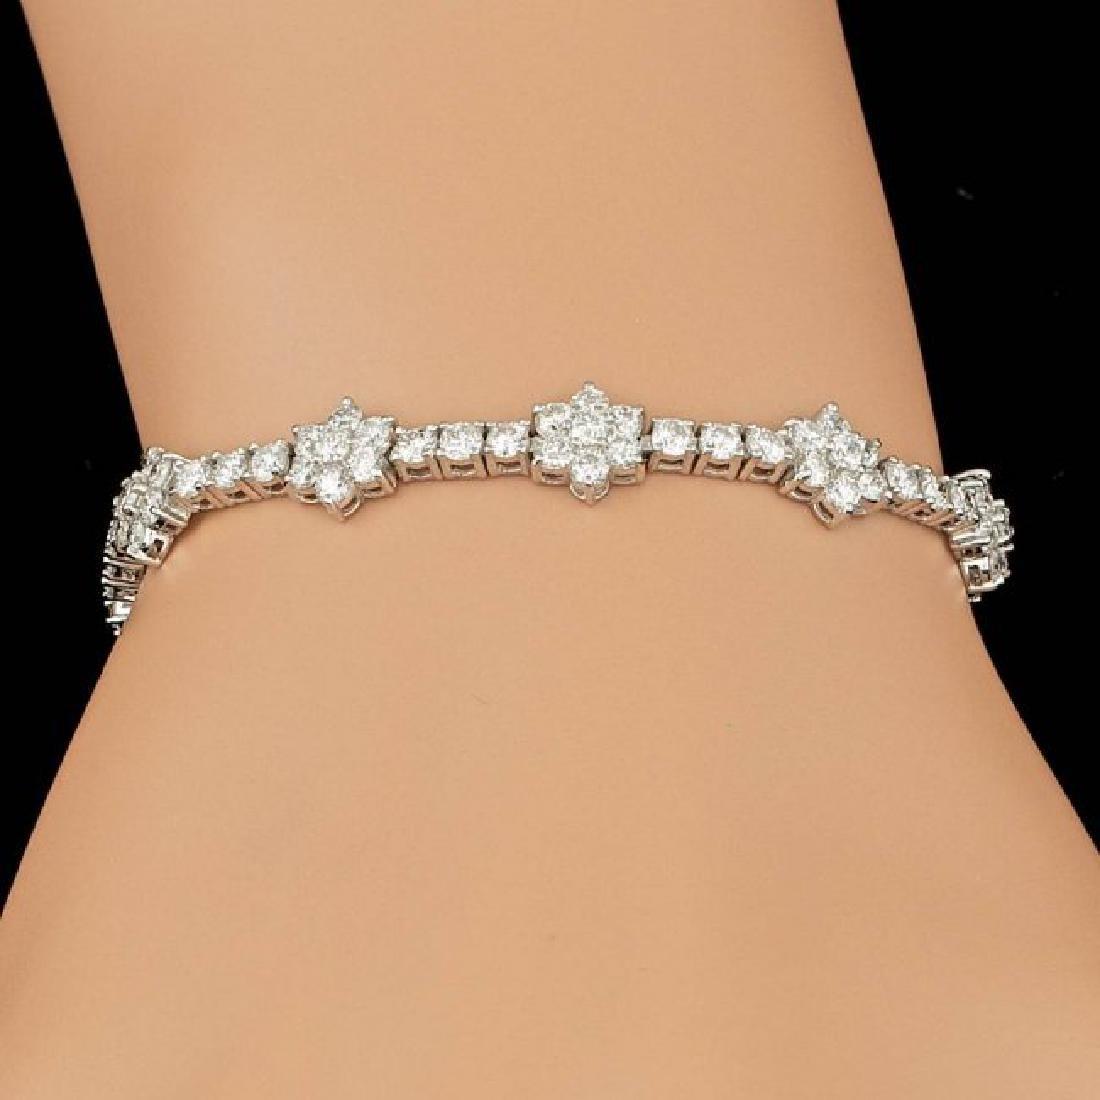 18k White Gold 6.80ct Diamond Bracelet - 7